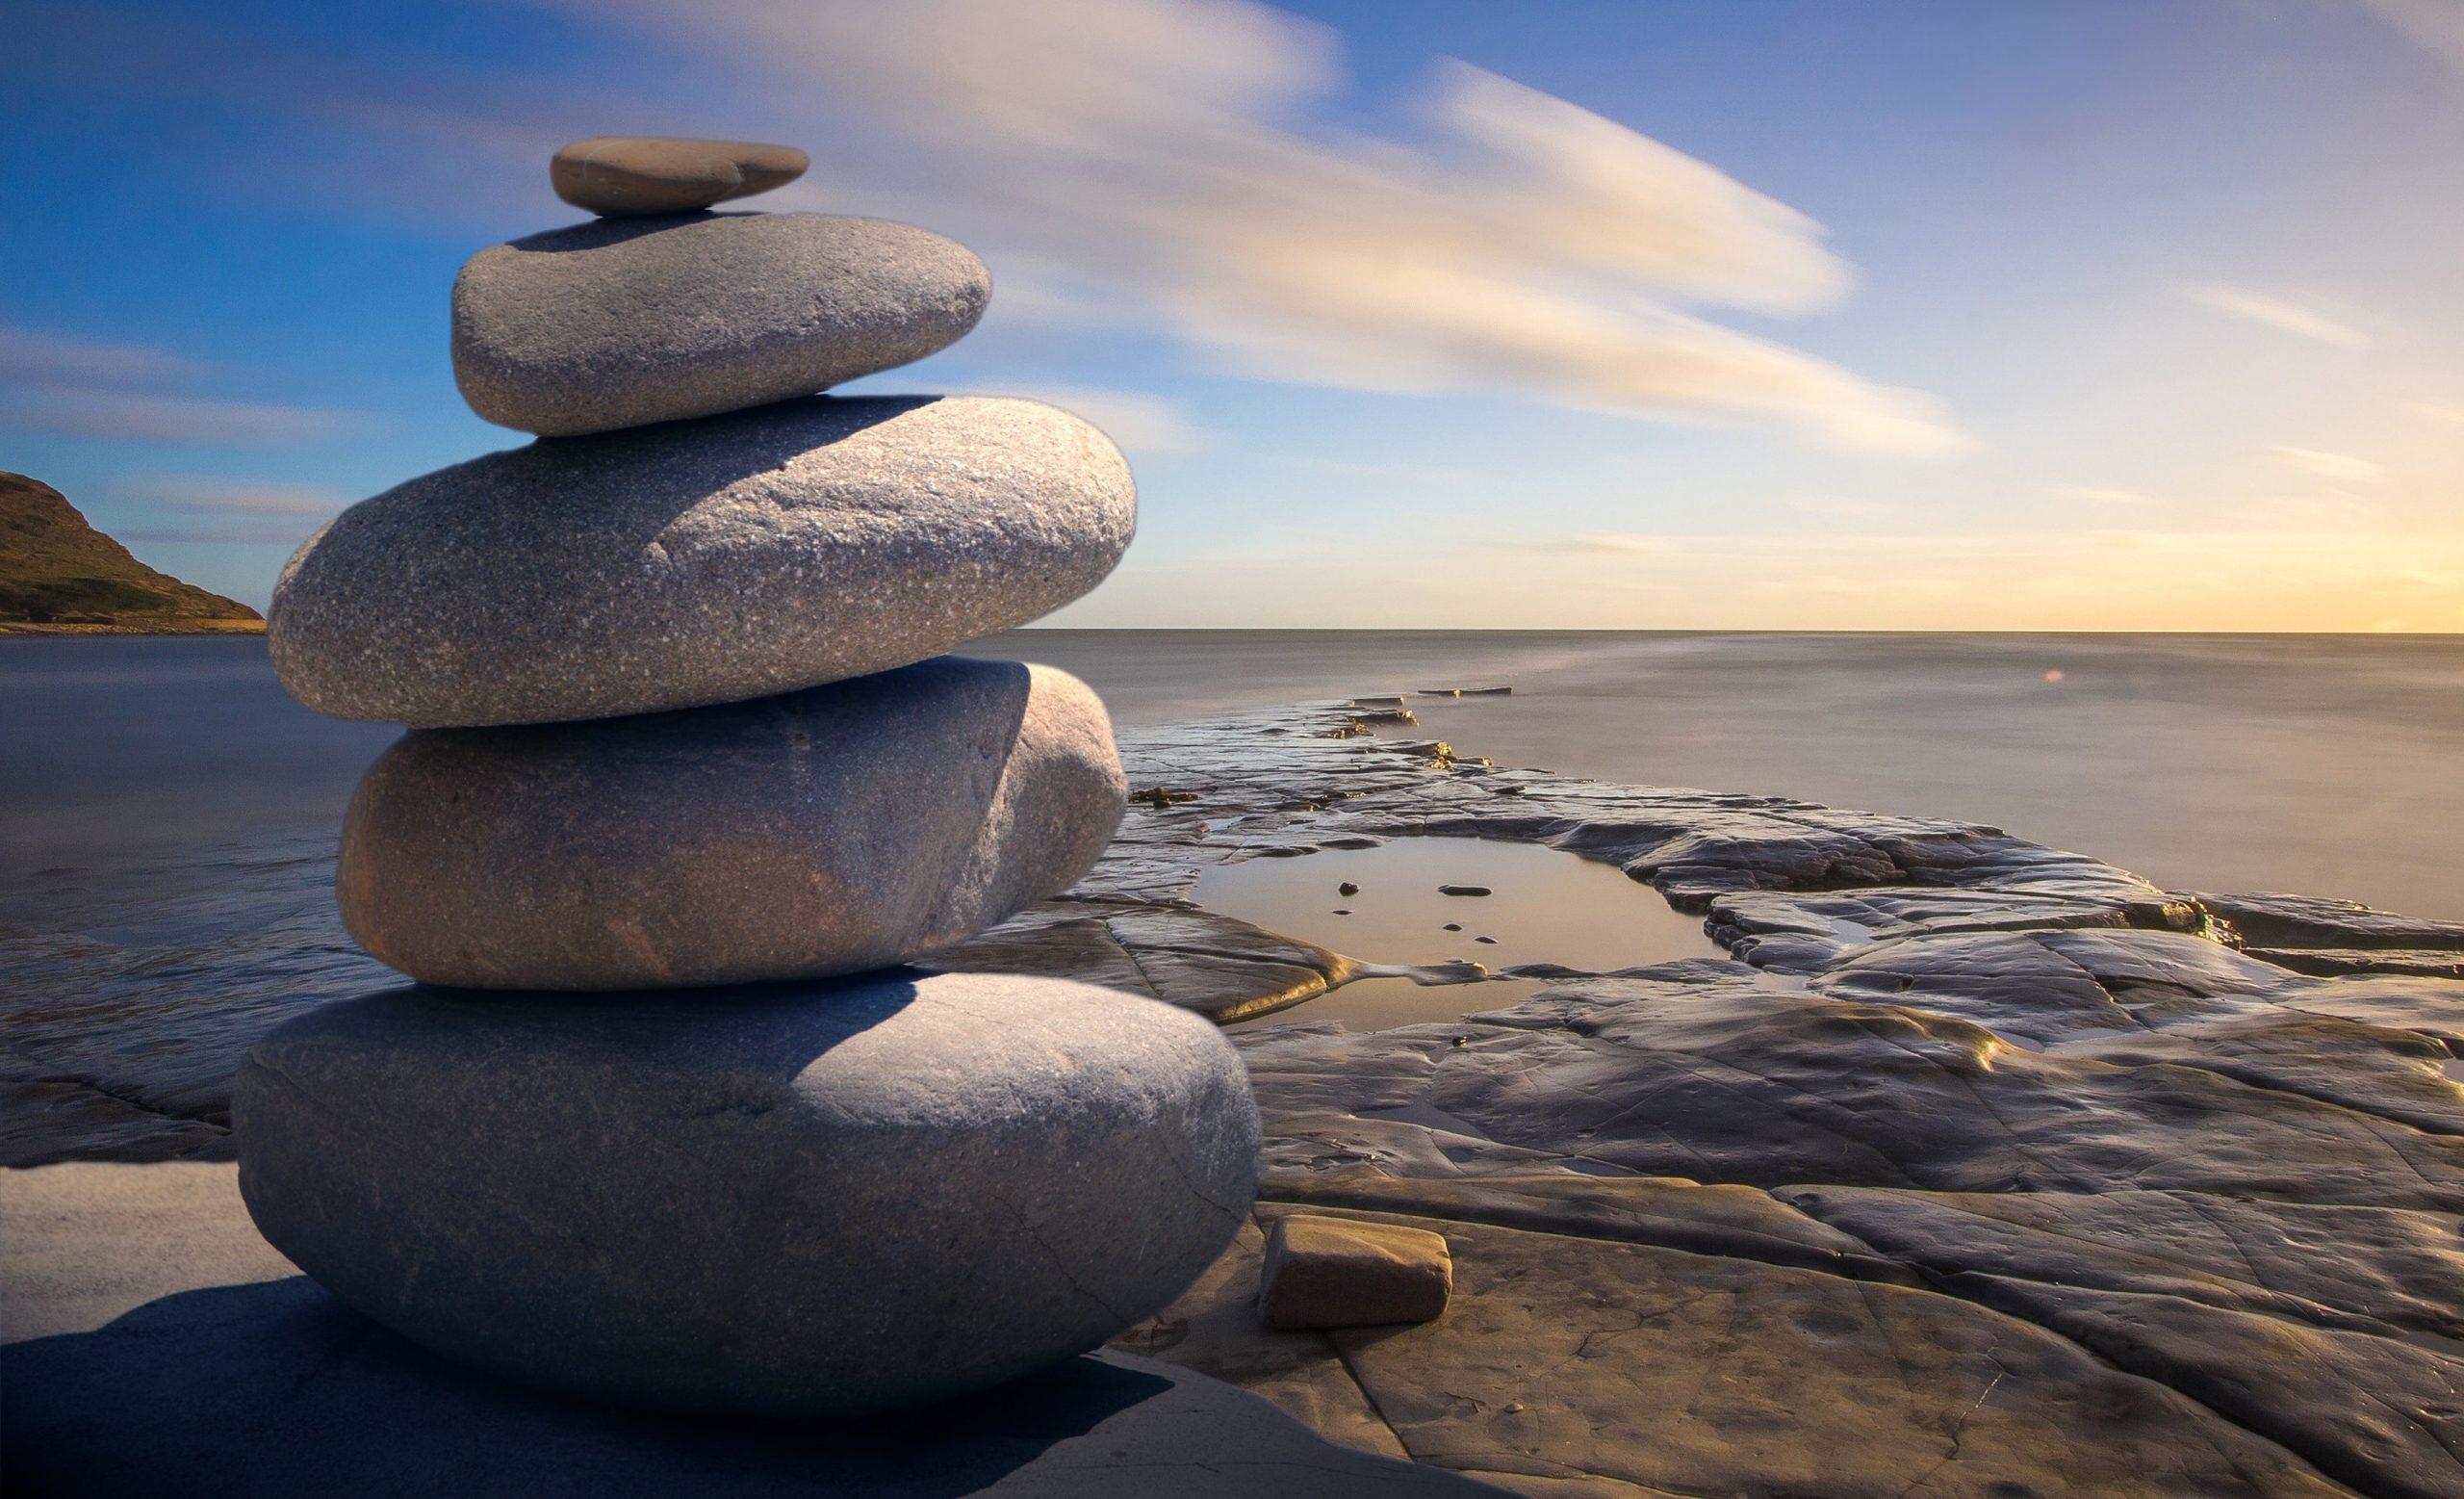 Literally, Spiritually, Emotionally – Raw Entrepreneurship